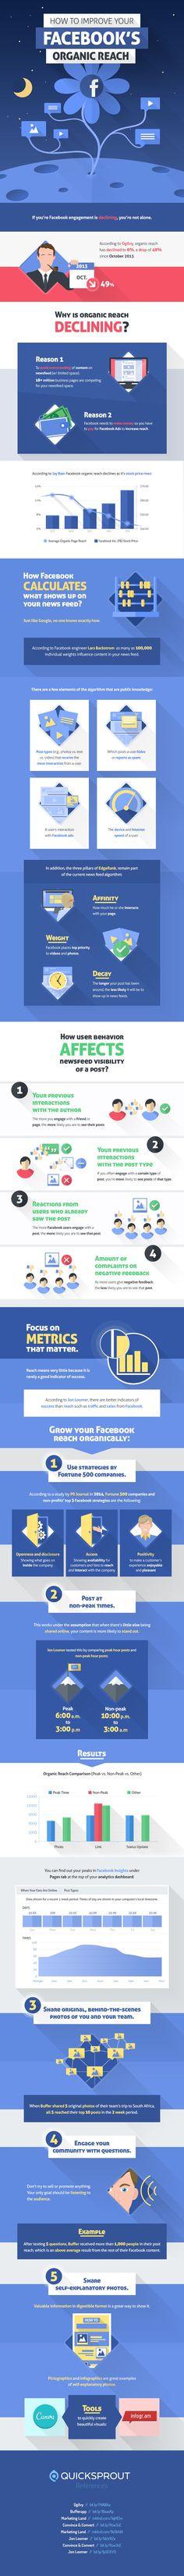 5 Creative Ways to Boost Your Facebook Organic Reach - #infographic #SocialMedia Marketing